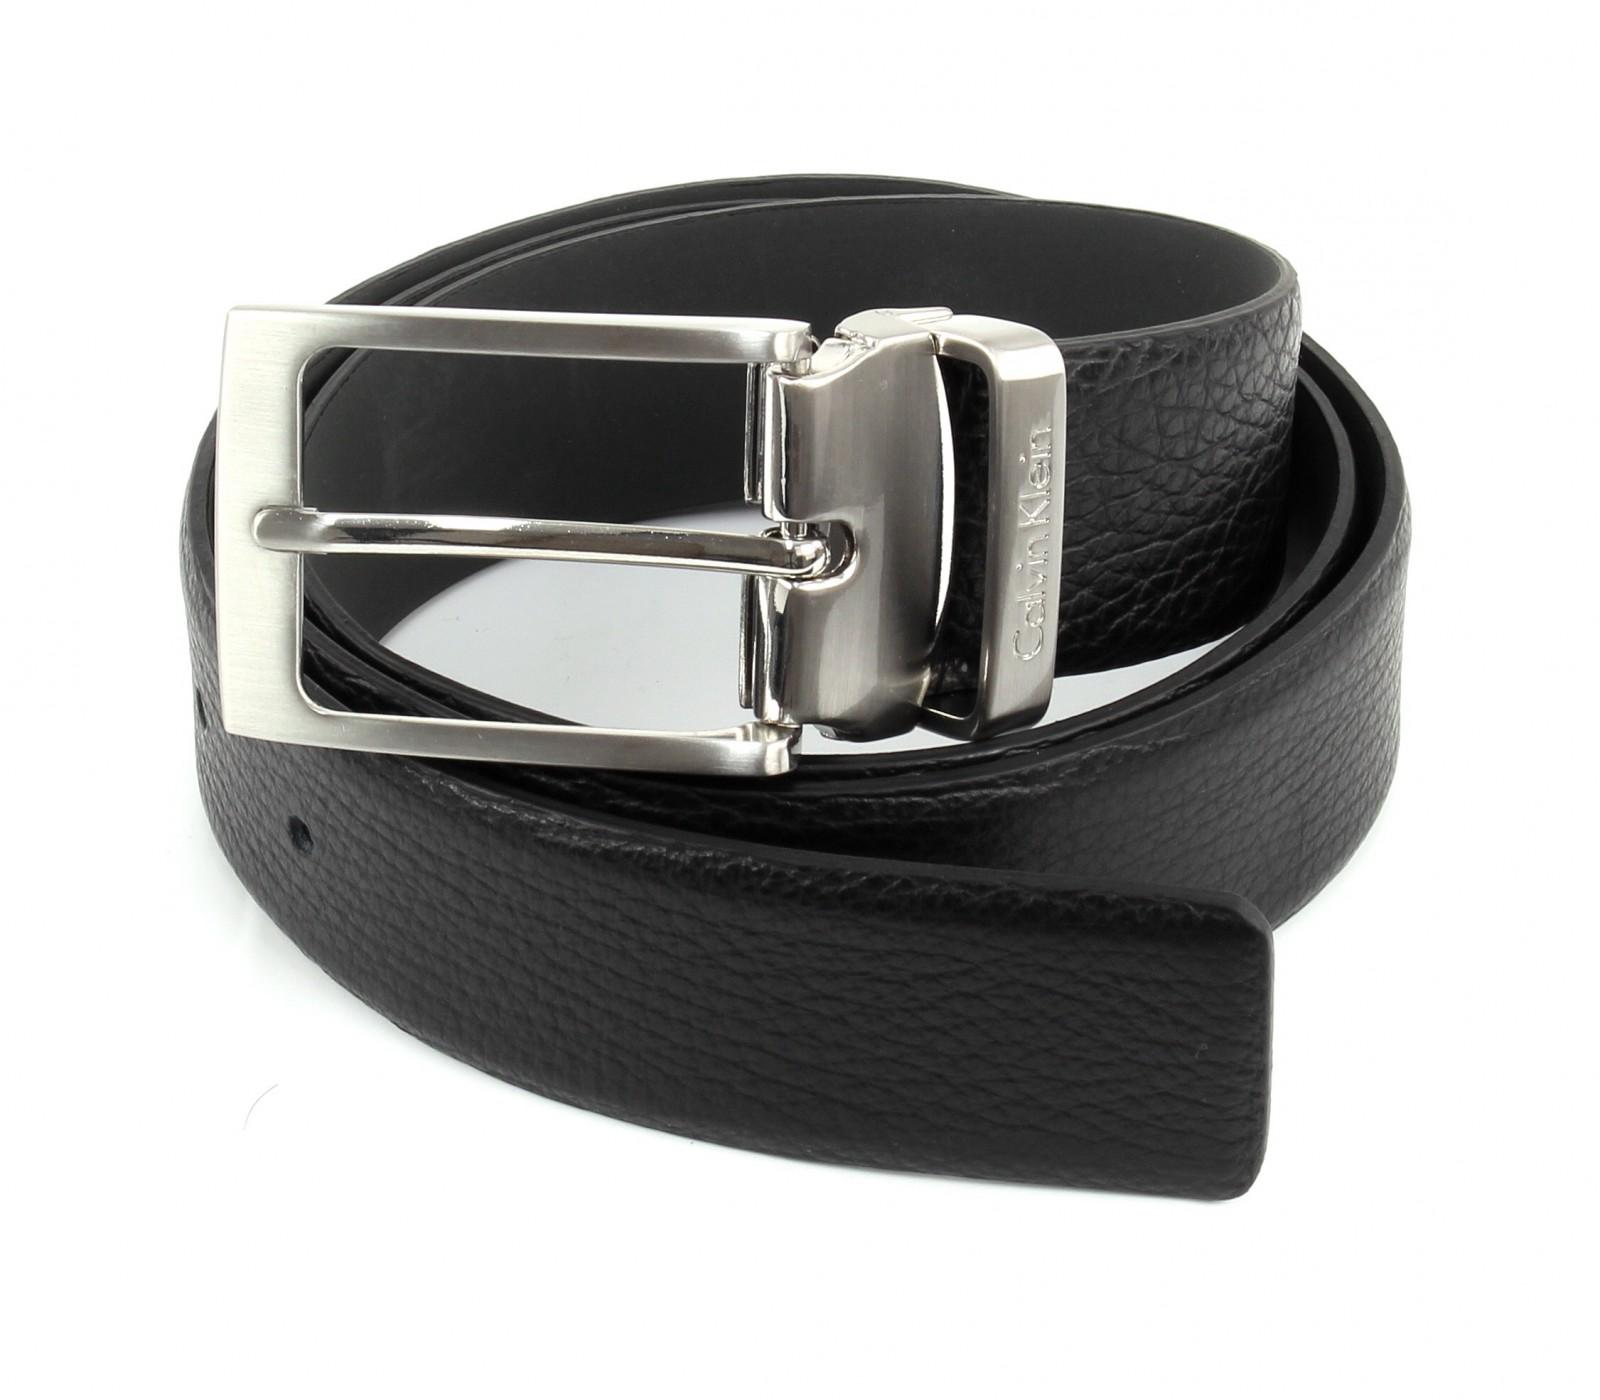 Calvin Klein Stand Alone Adjustable Pebble Belt W110 Black